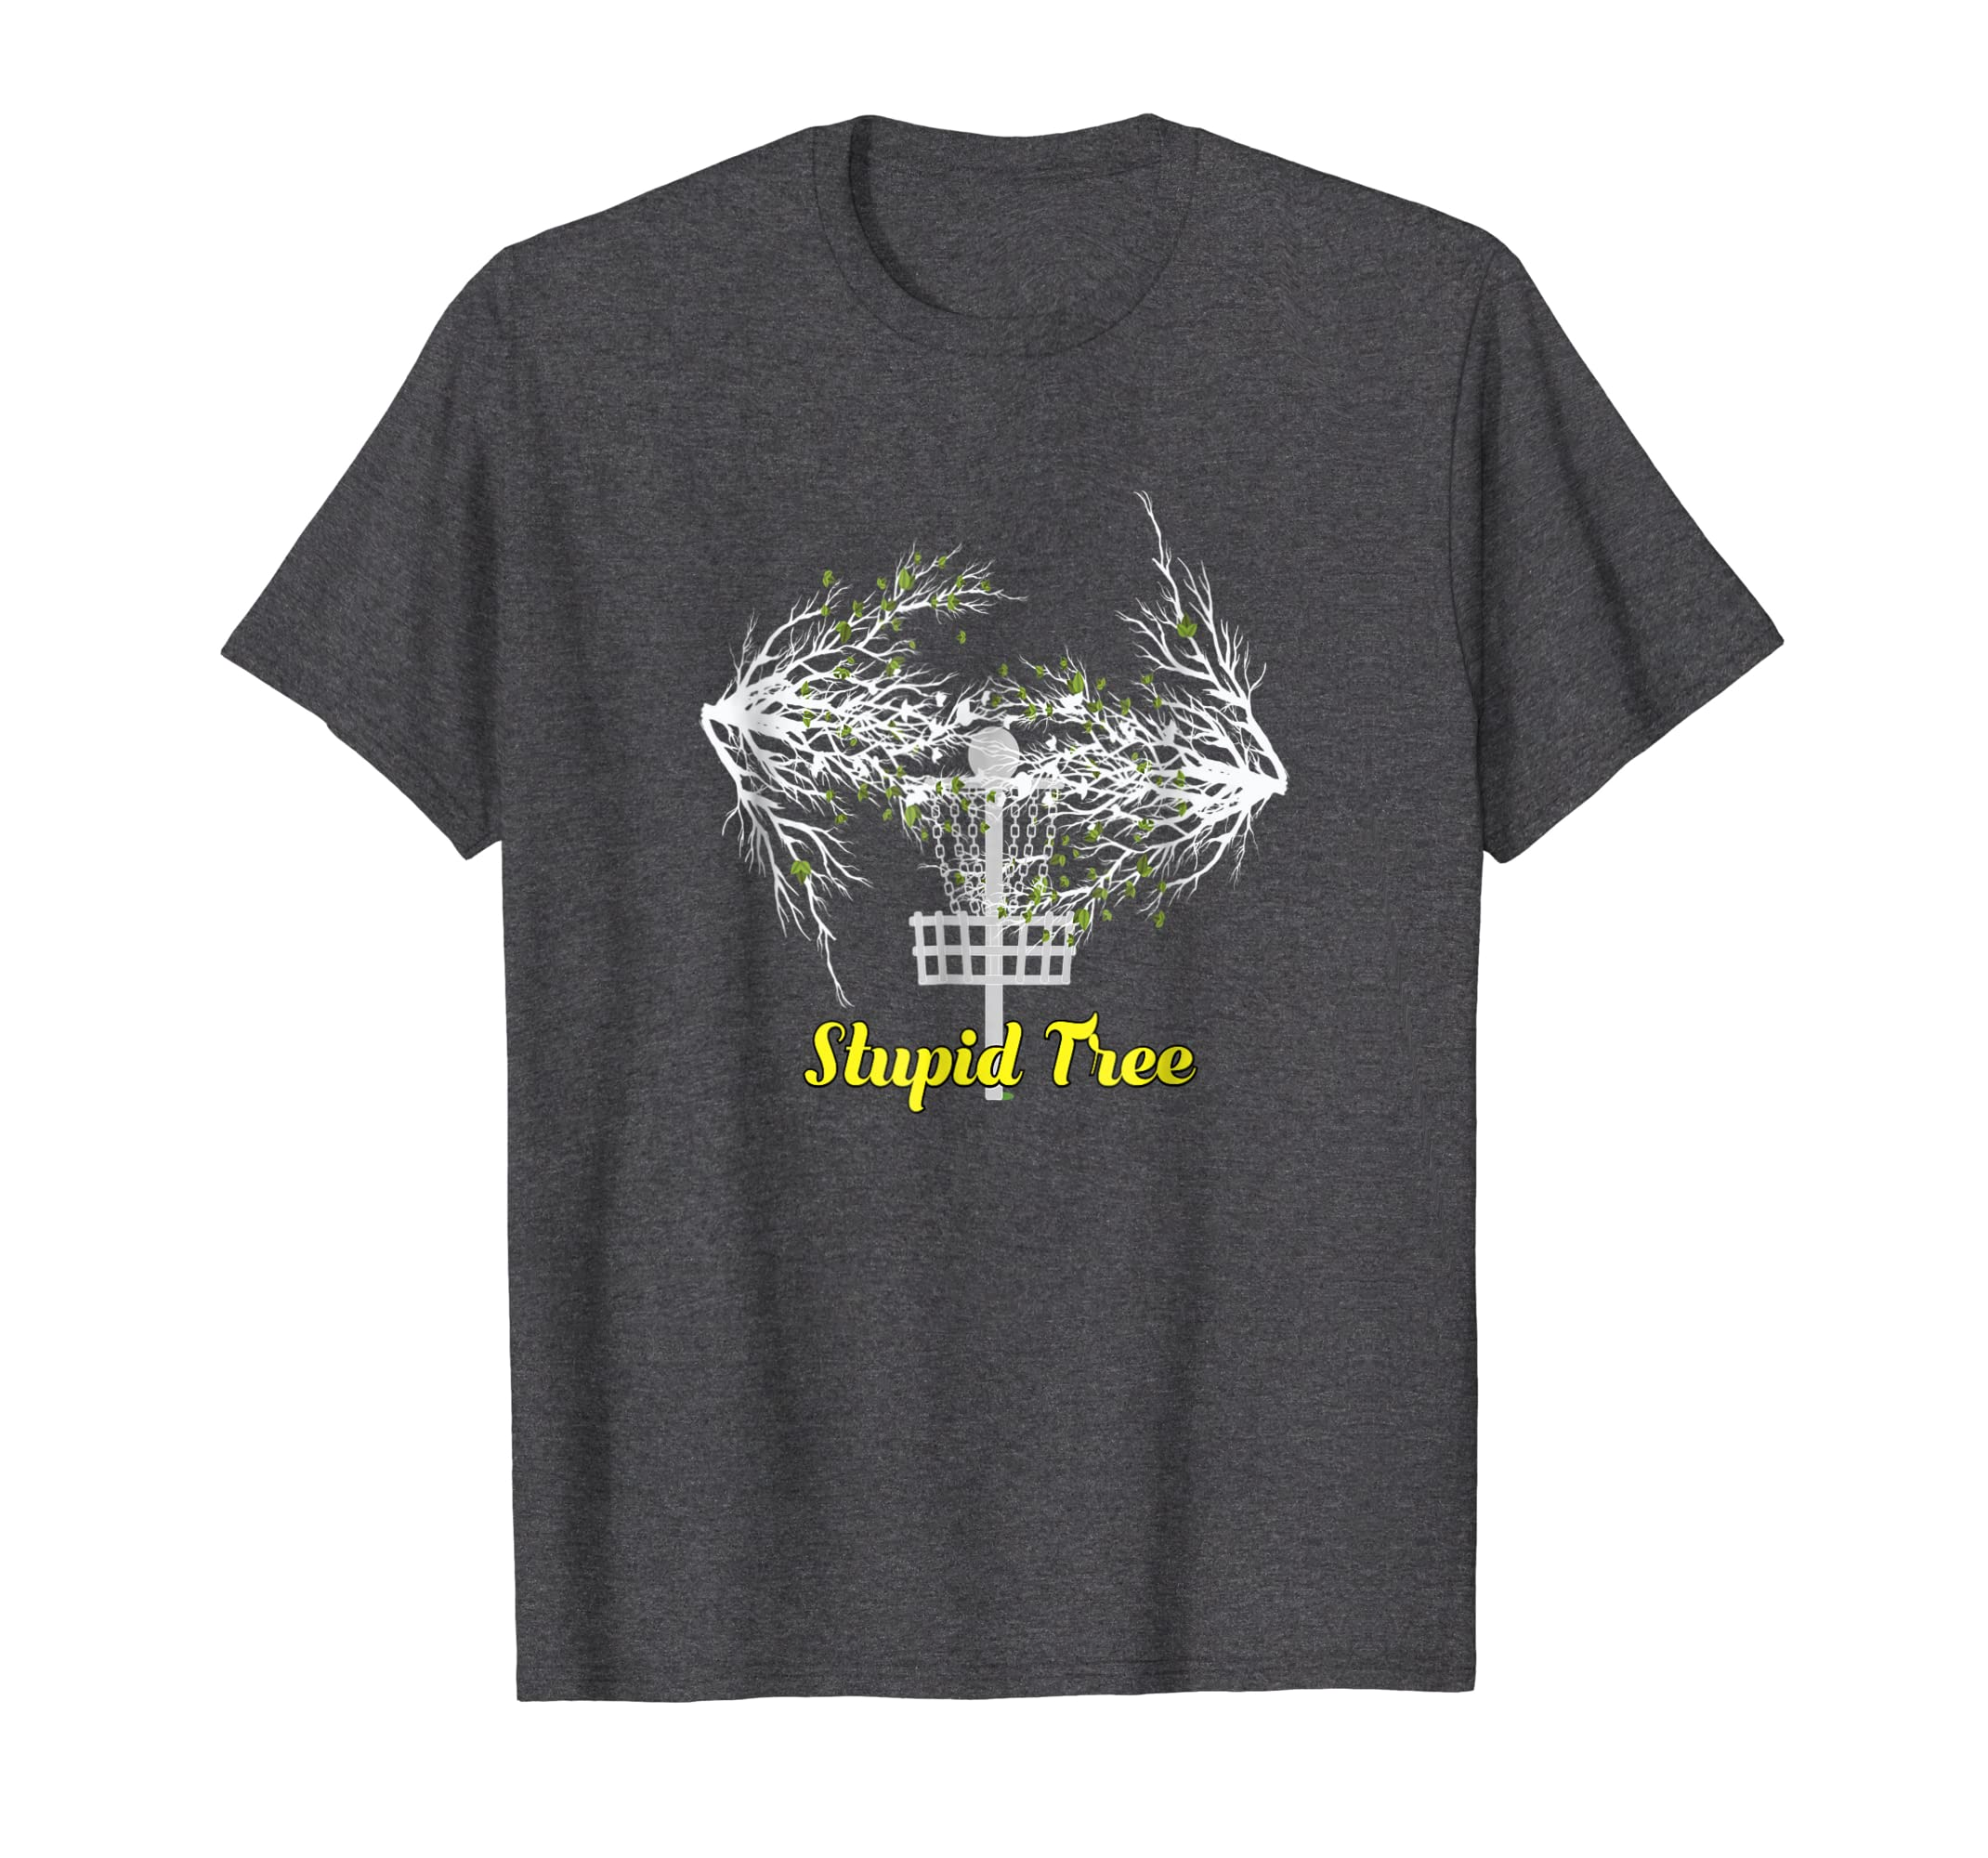 e84029f68 Amazon.com: Stupid Tree Disc Golf T-Shirt Funny Frisbee Golf Frolf Tee:  Clothing